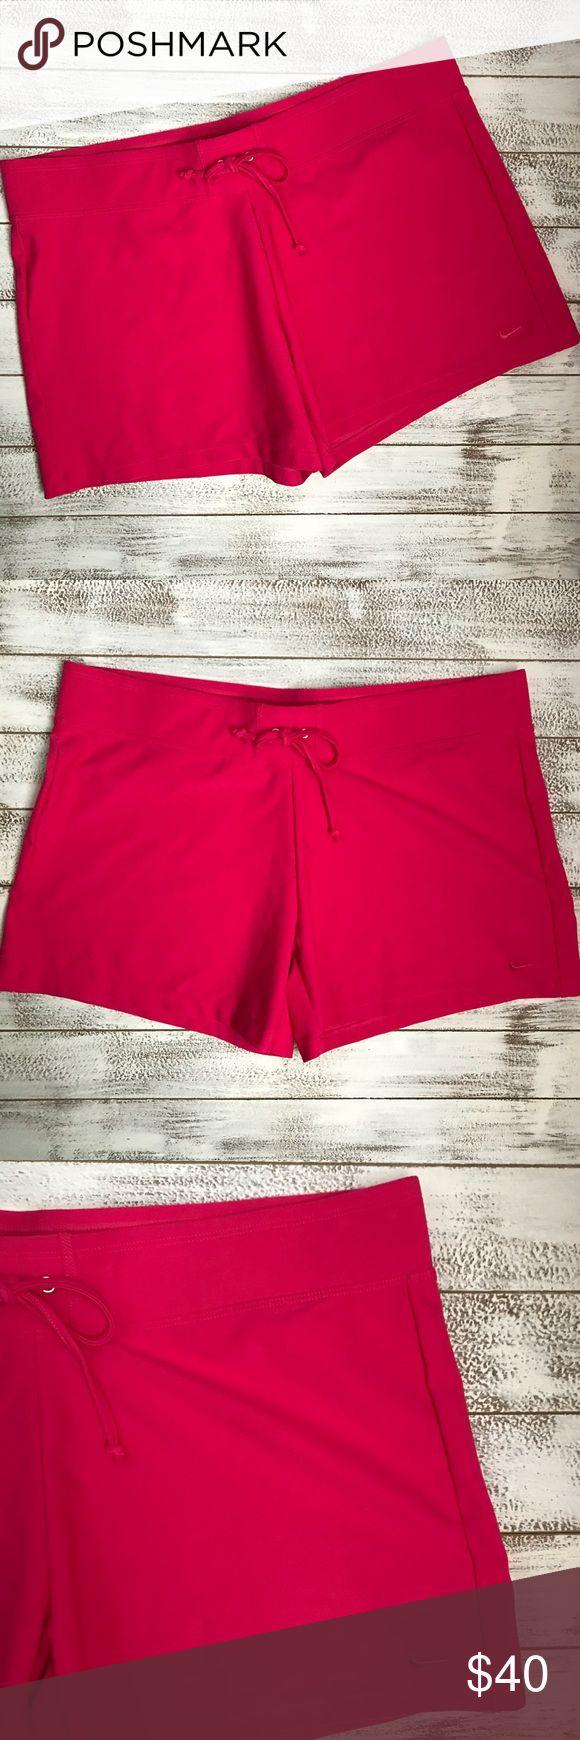 NIKE DEI-FIT SHORTS Nike Dri-Fit Shorts Größe XL (16-18) NWOT Neuwertig 88% …   – My Posh Picks